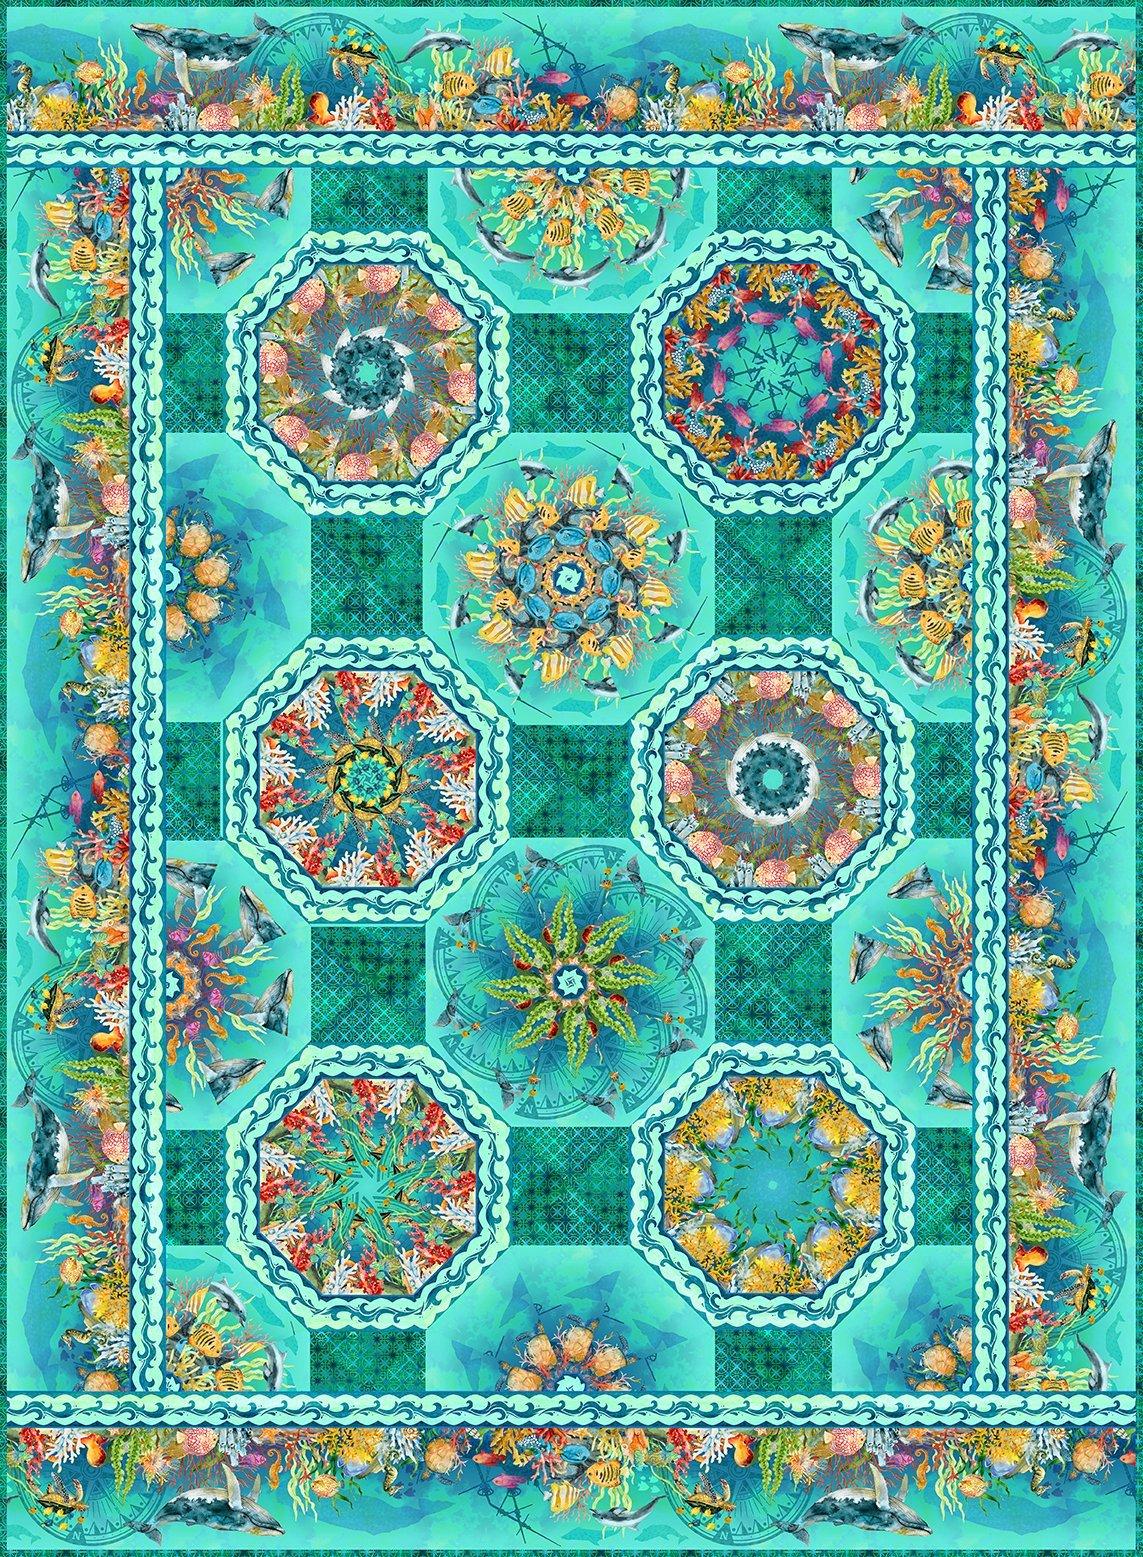 Calypso One-Fabric Kaleidoscope Quilt Pattern